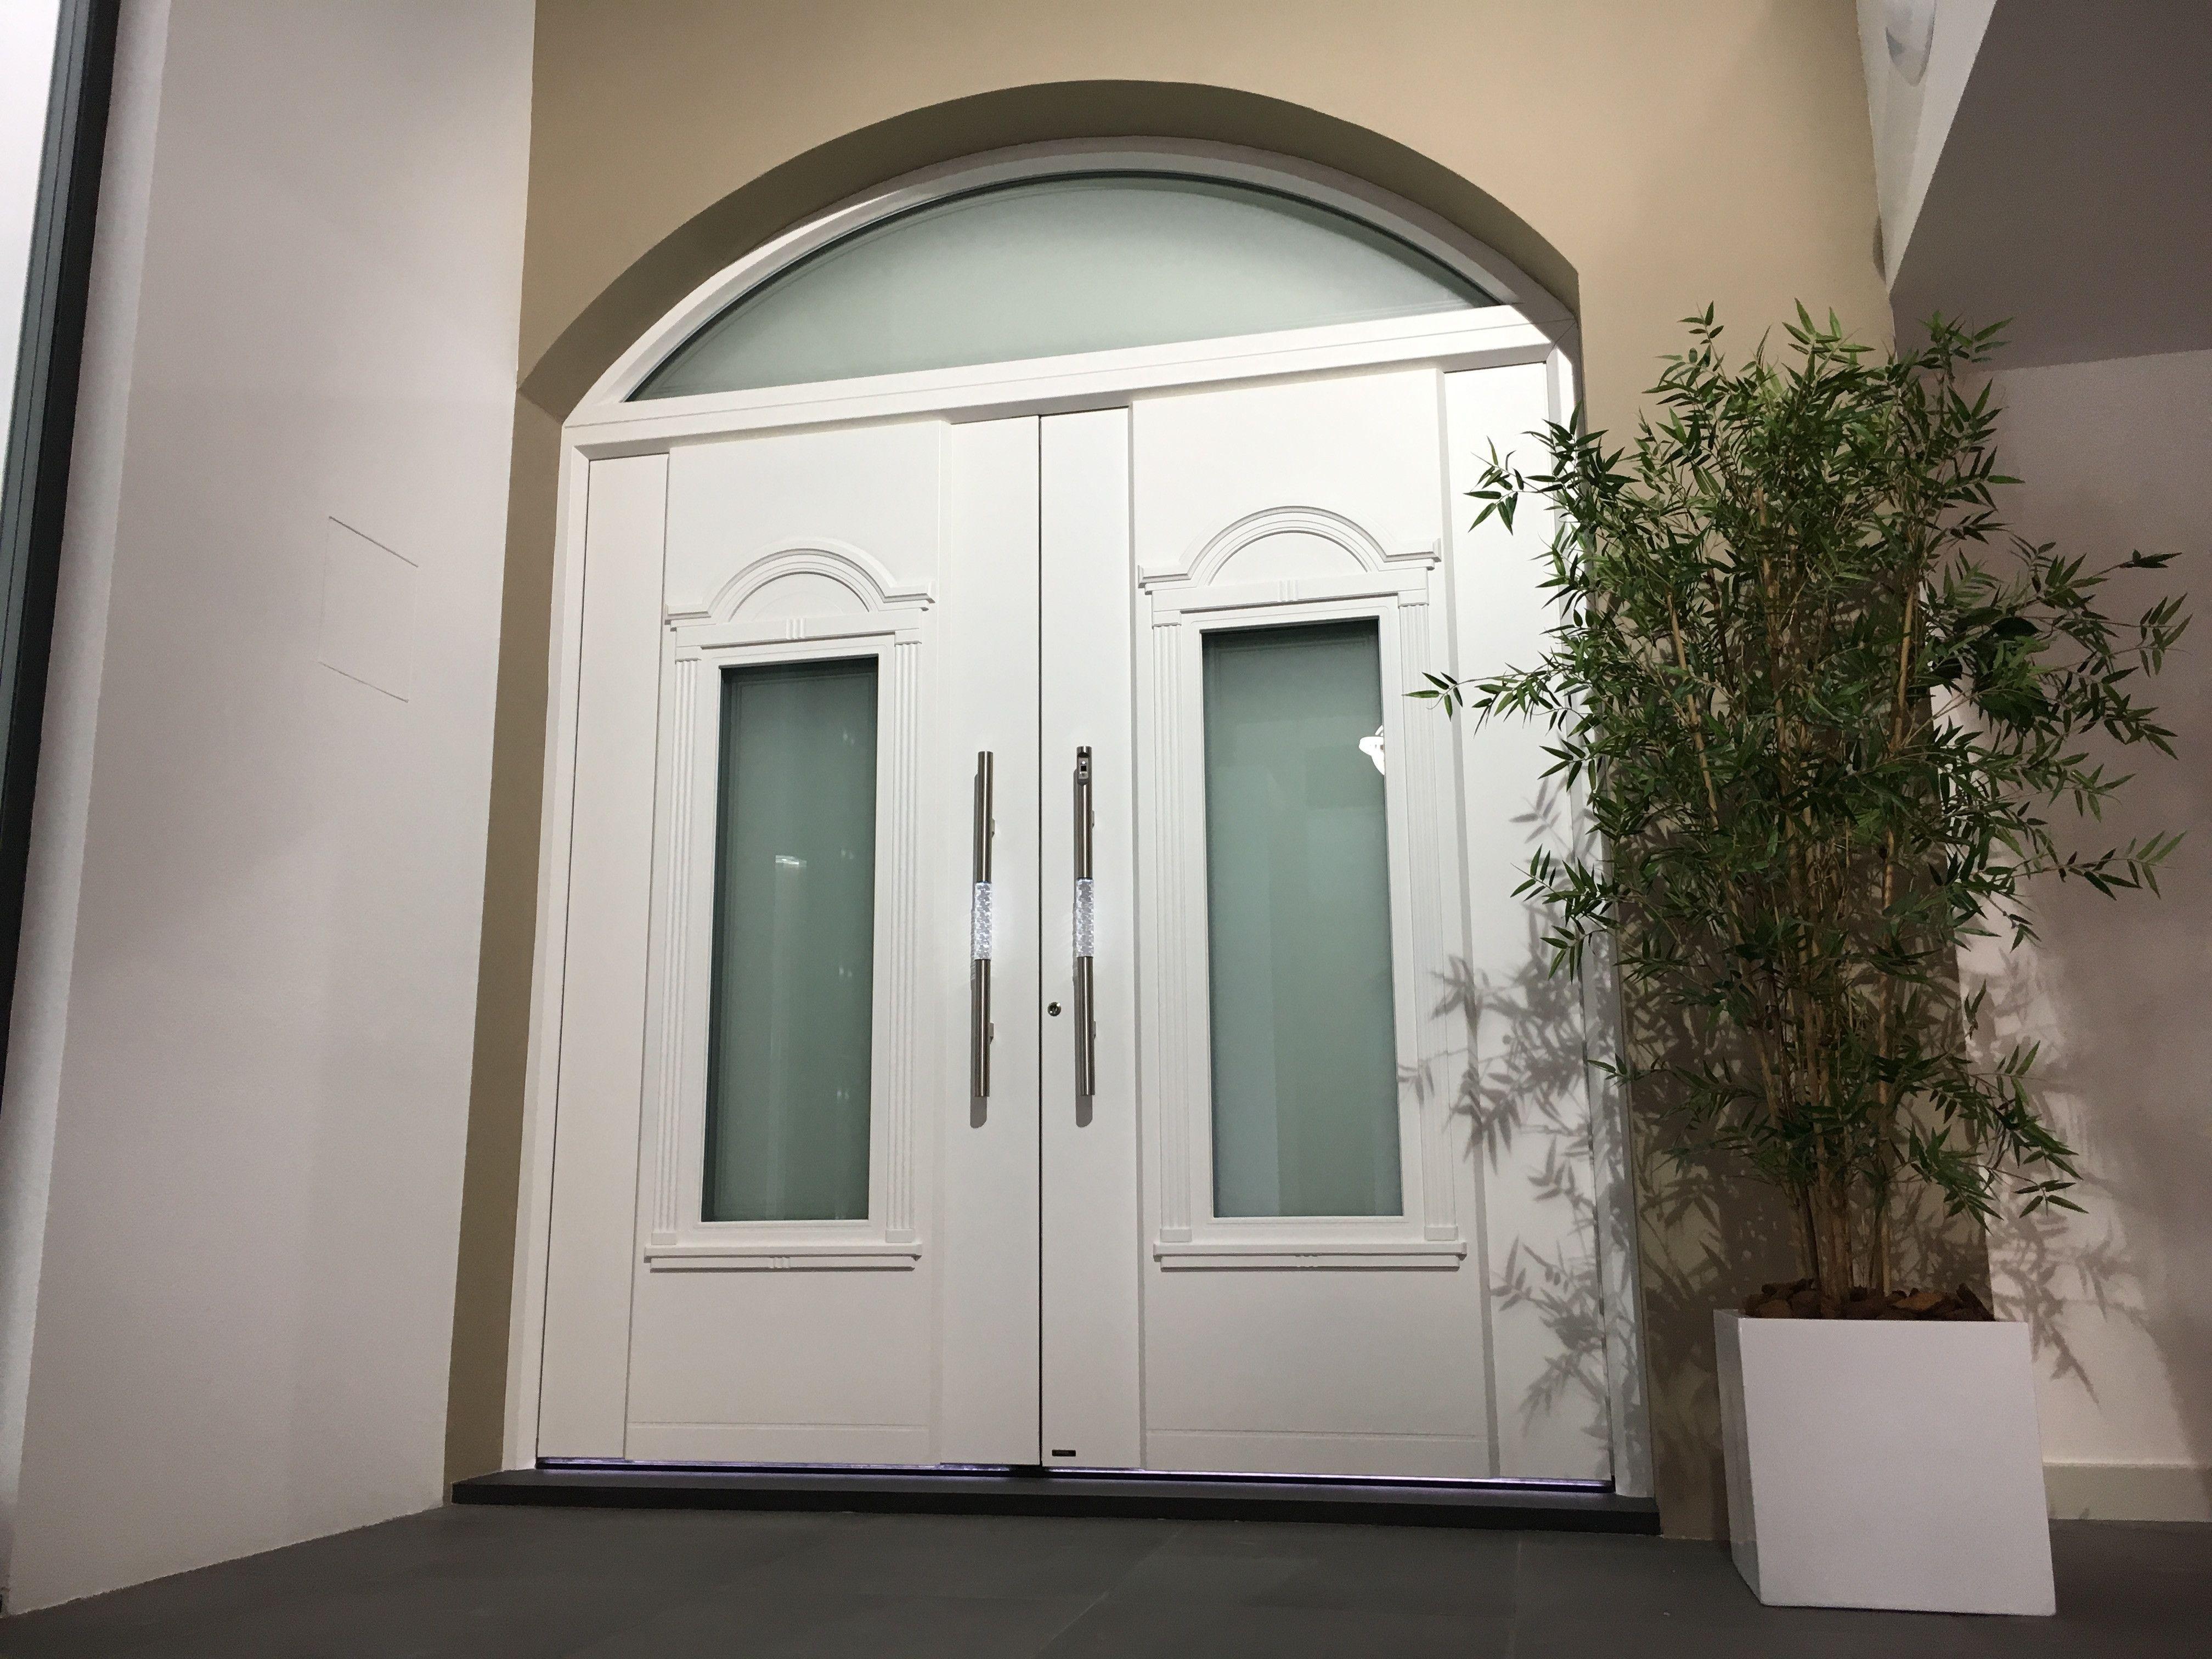 Pirnar Double Entry Front Doors In 2020 Modern Entrance Door Front Door Design Modern Entrance